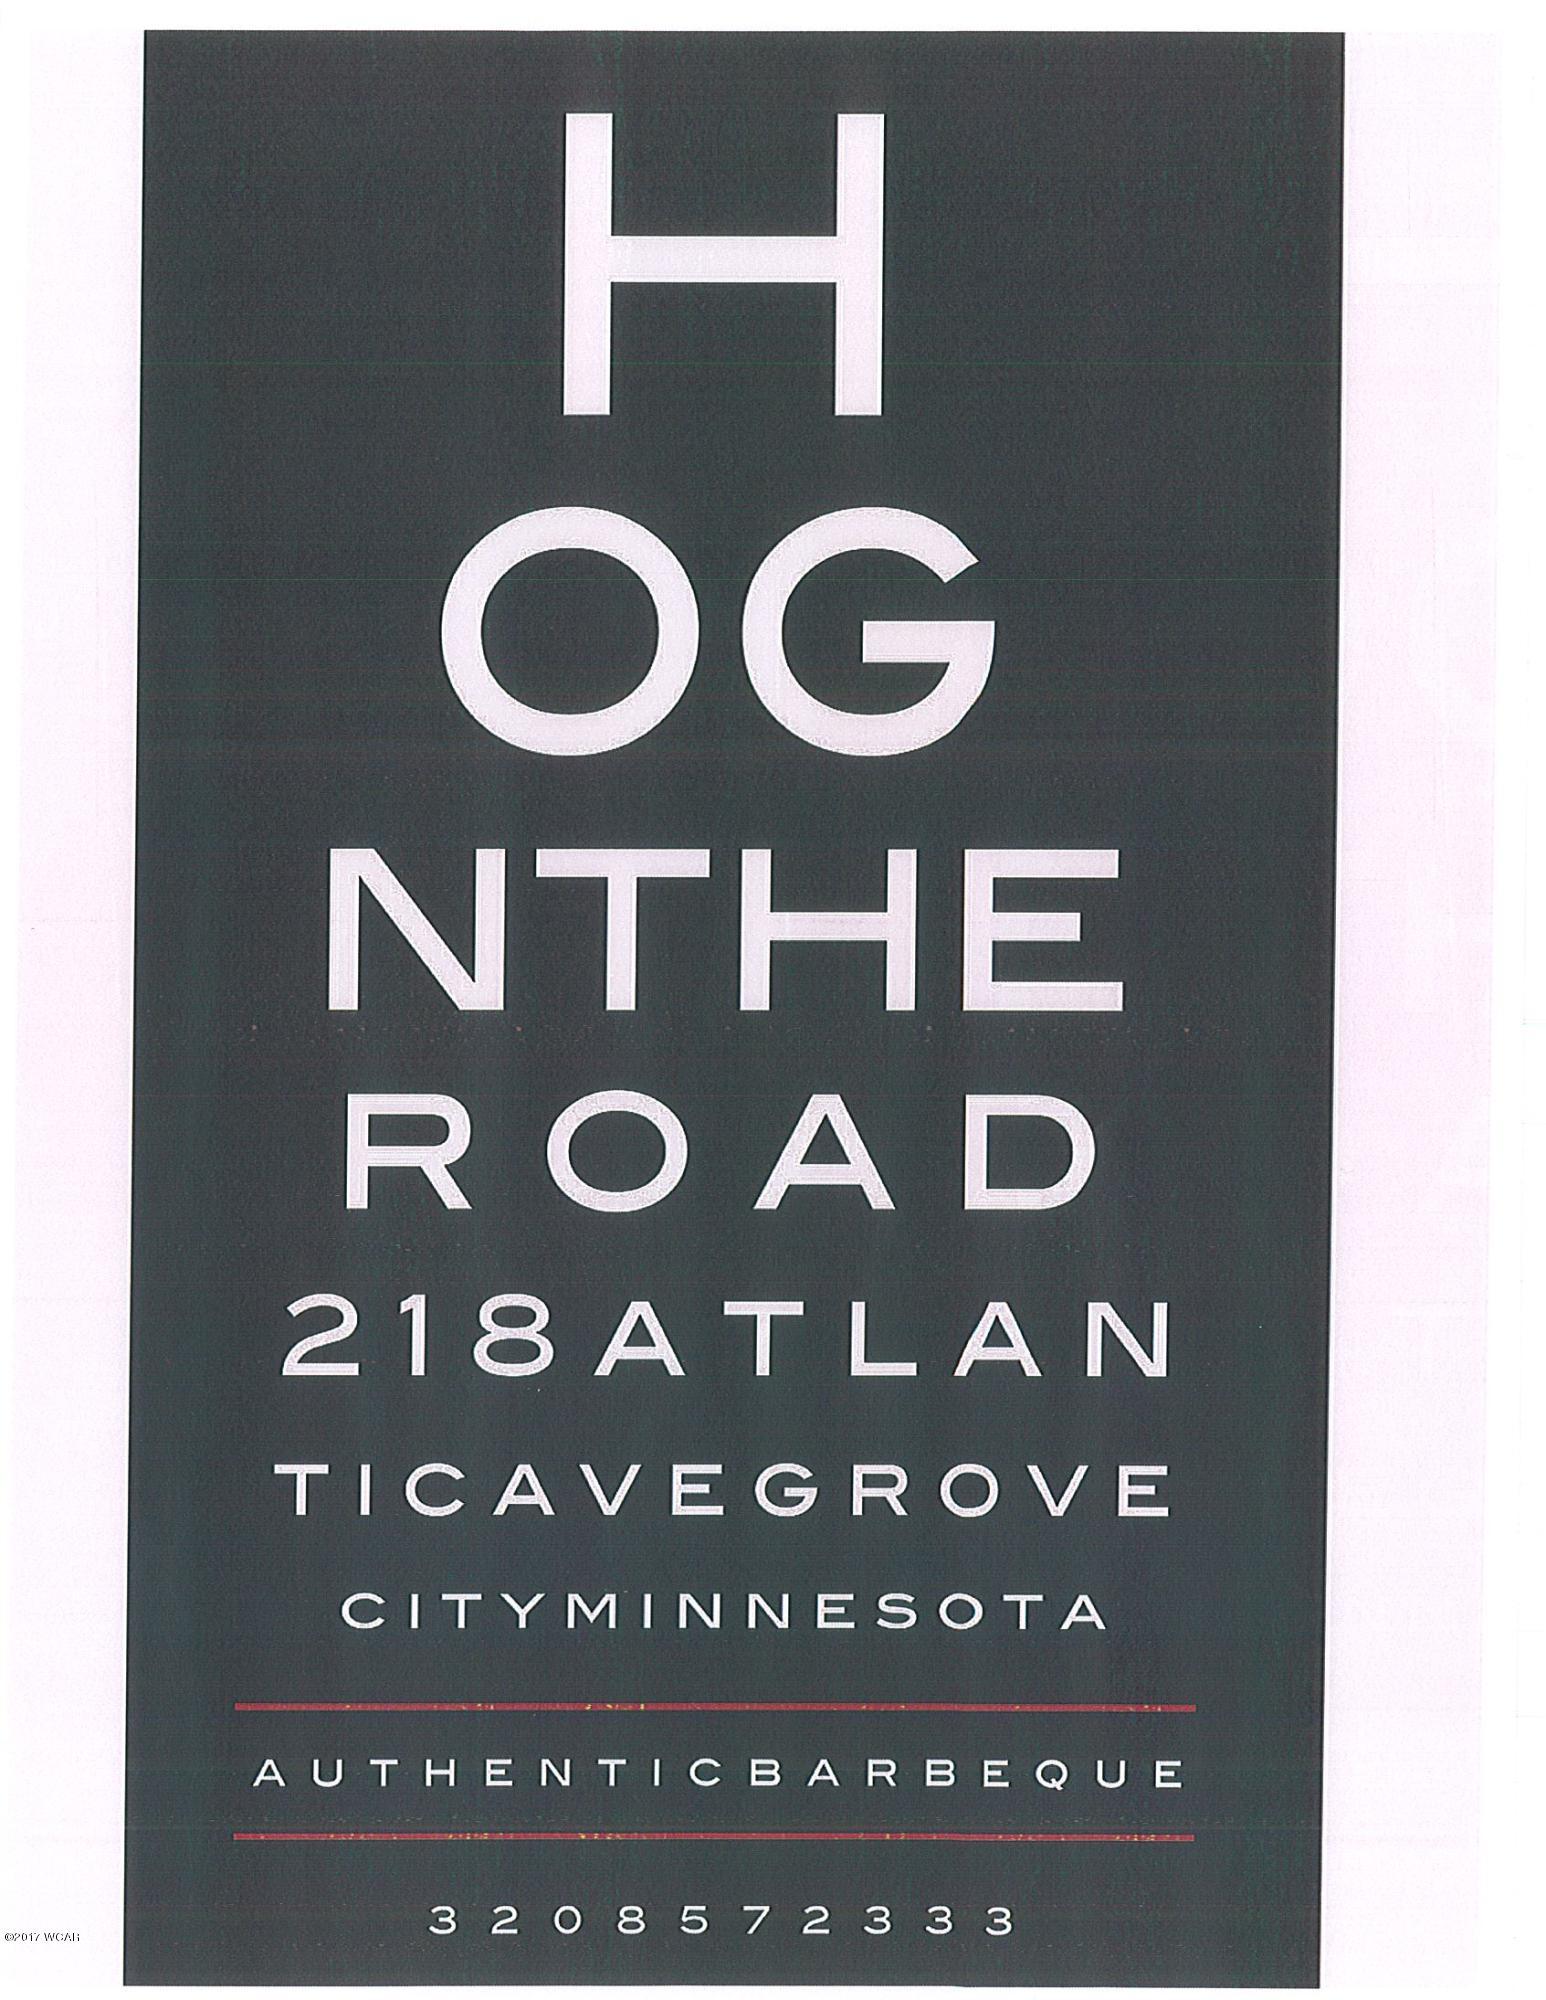 218 Atlantic Avenue,Grove City,Commercial,Atlantic Avenue,6028974